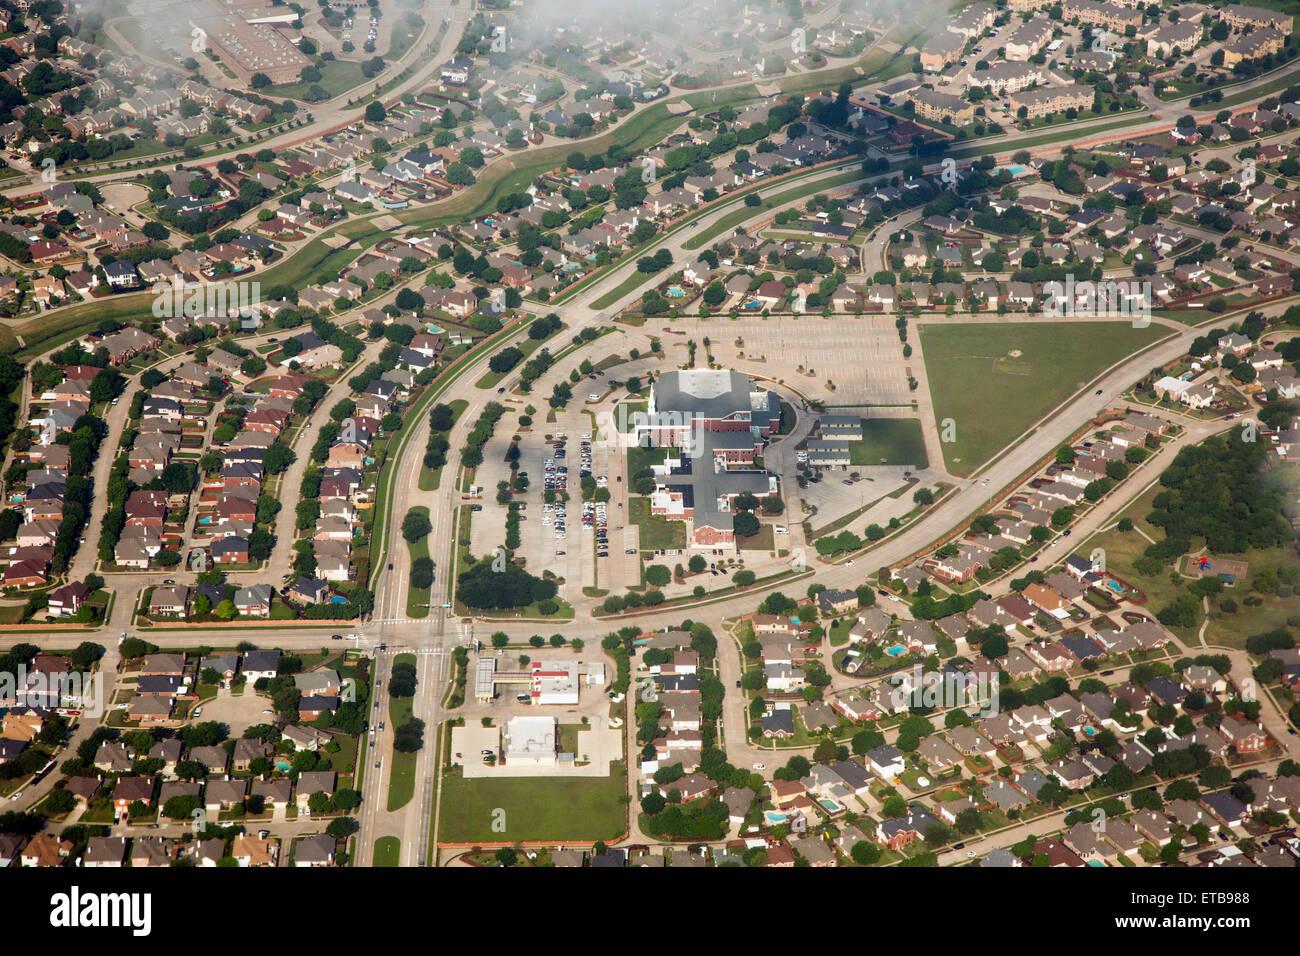 lewisville texas first baptist church in a suburban community